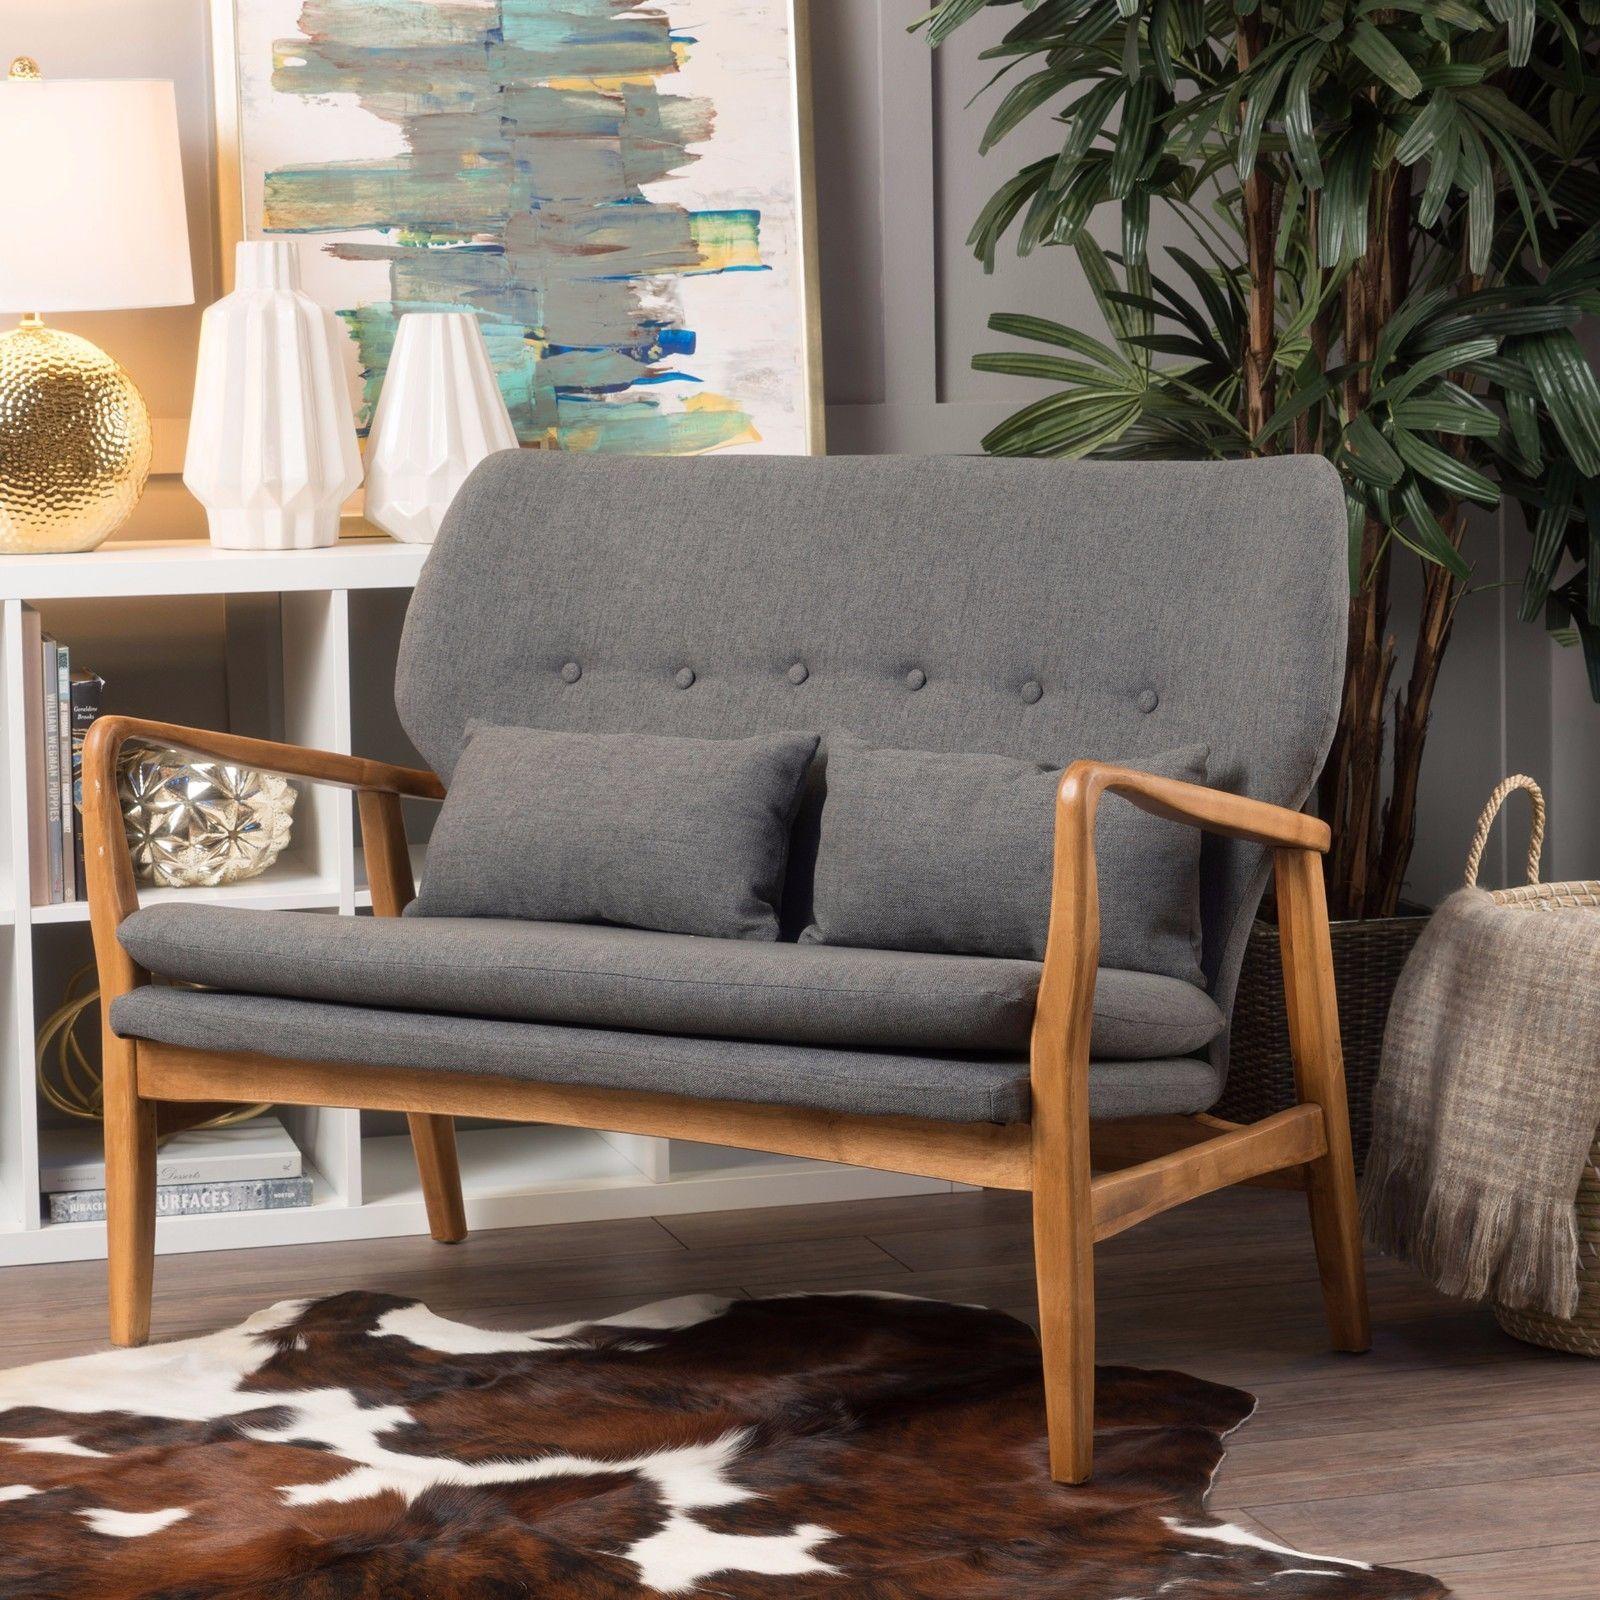 Ventura mid century modern design bentwood upholstered loveseat upholstered loveseat bentwood design century modern ventura